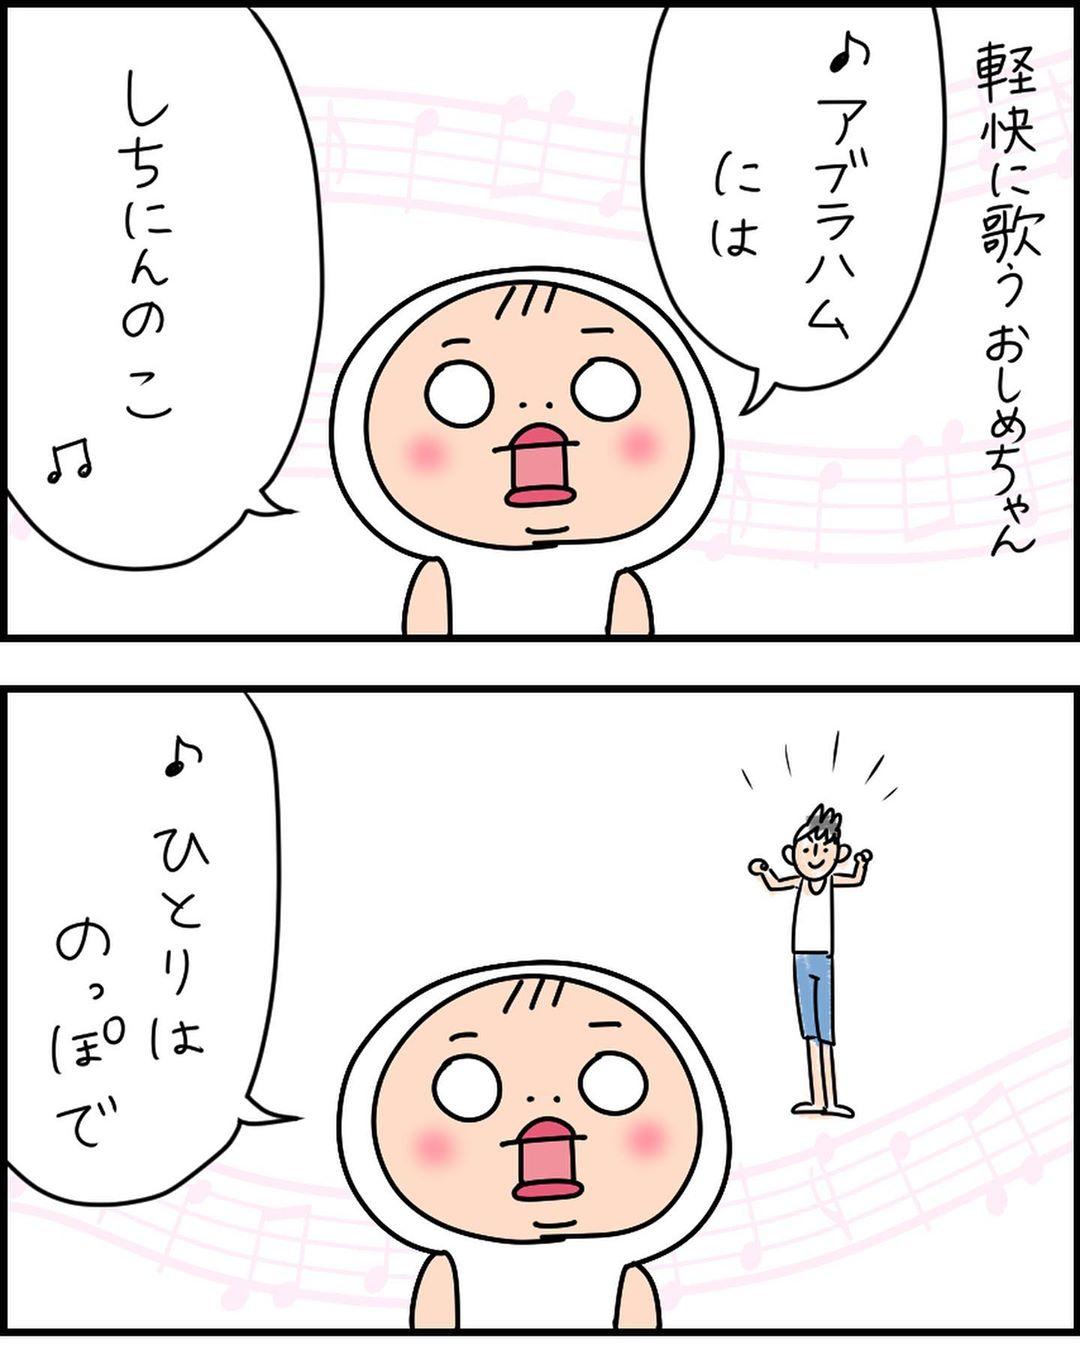 nikunohi029_61695650_107737177065540_3273207525082720027_n